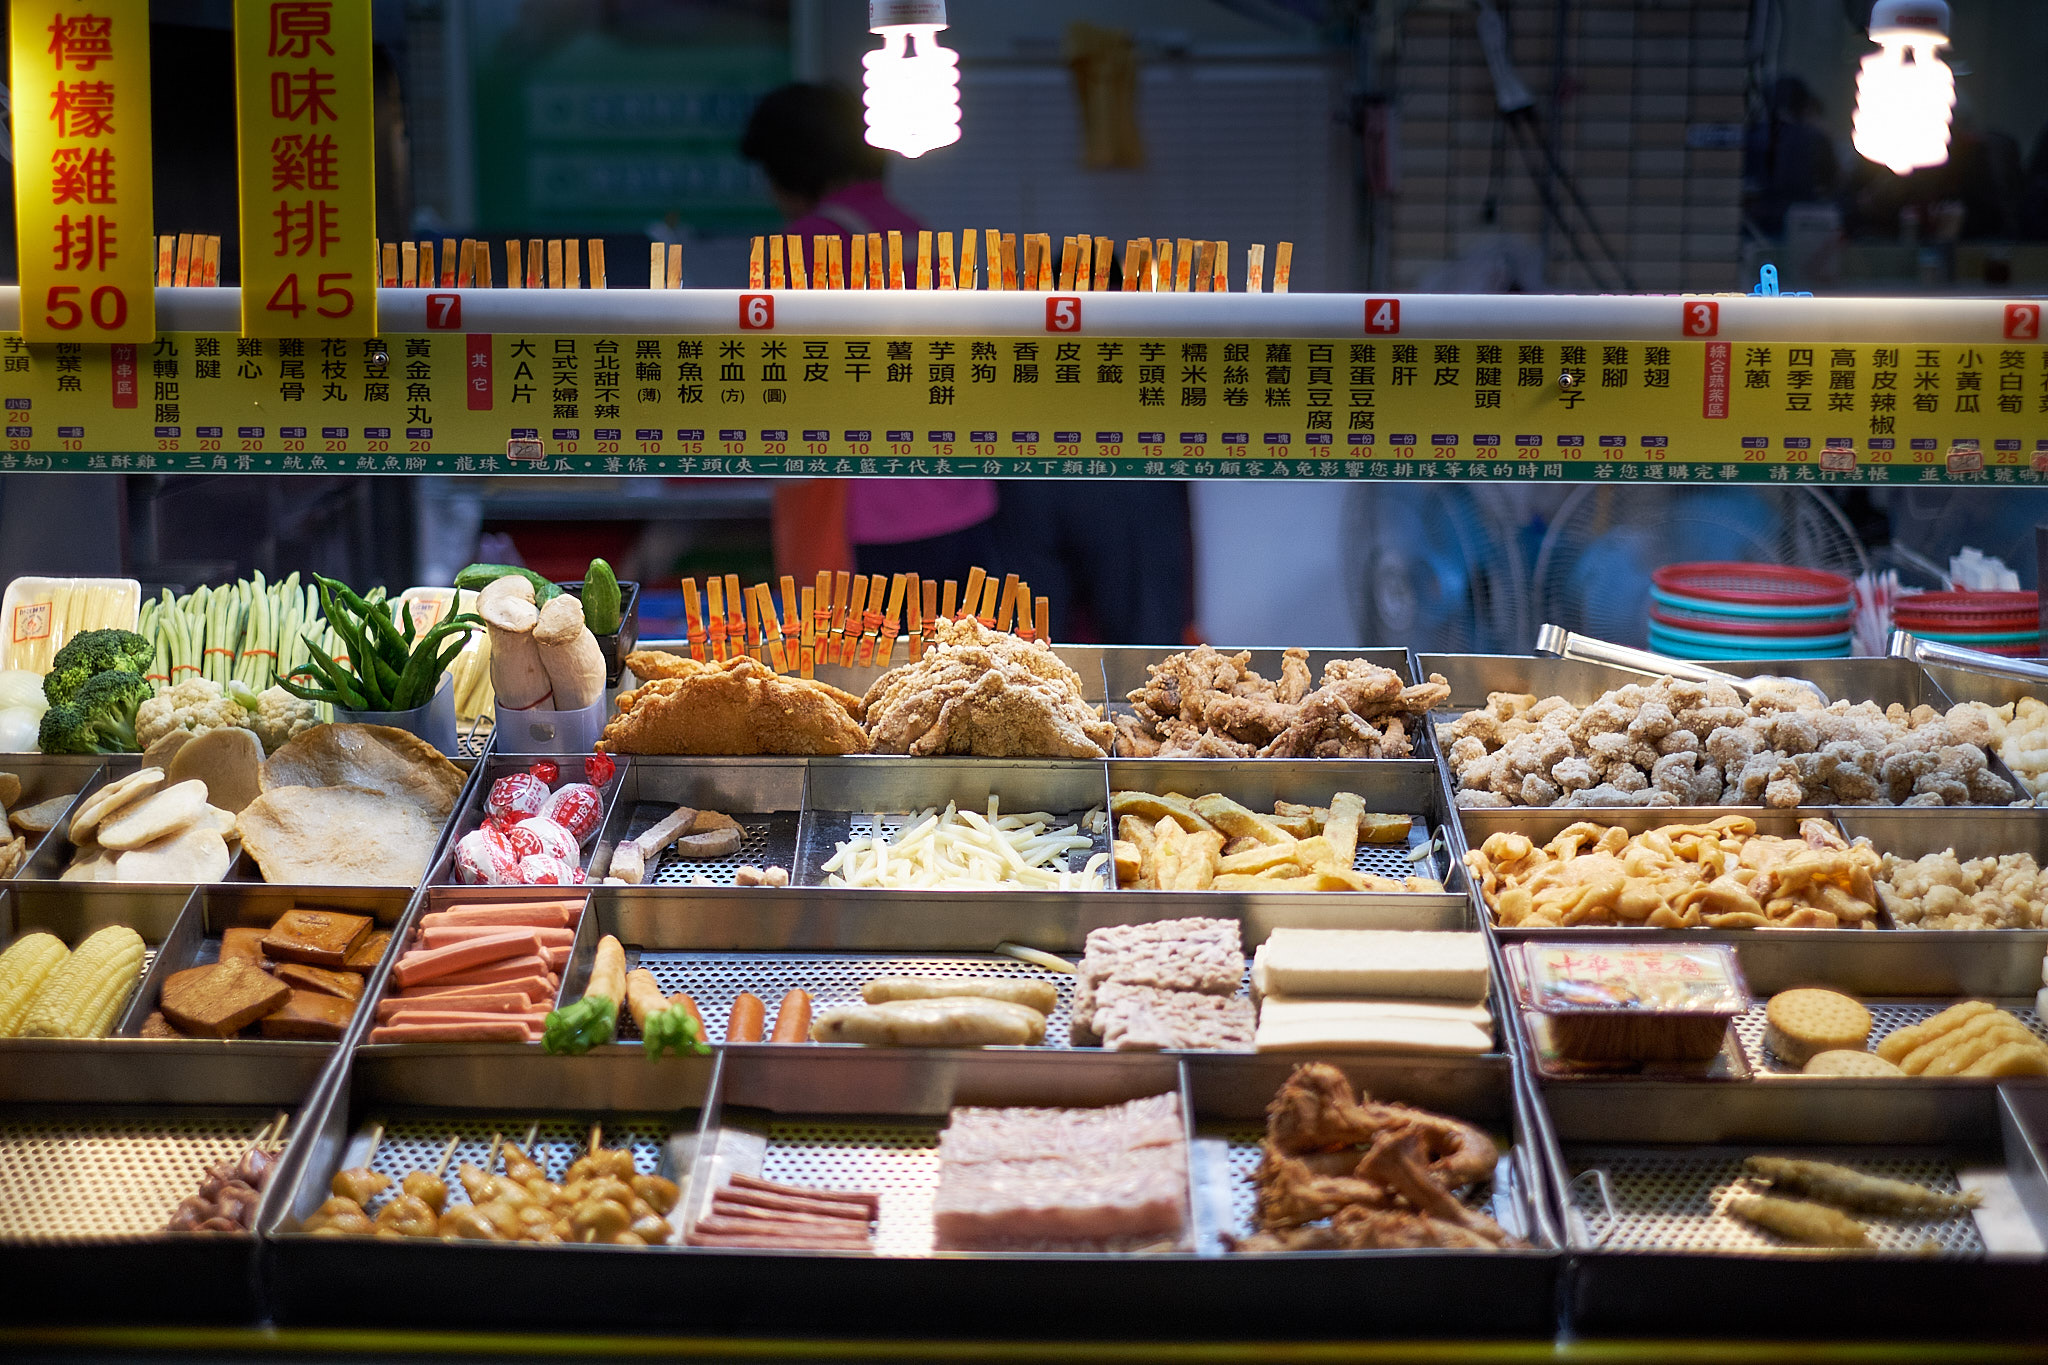 Taiwan Food. Fujifilm XT2 - XF35mmF1.4